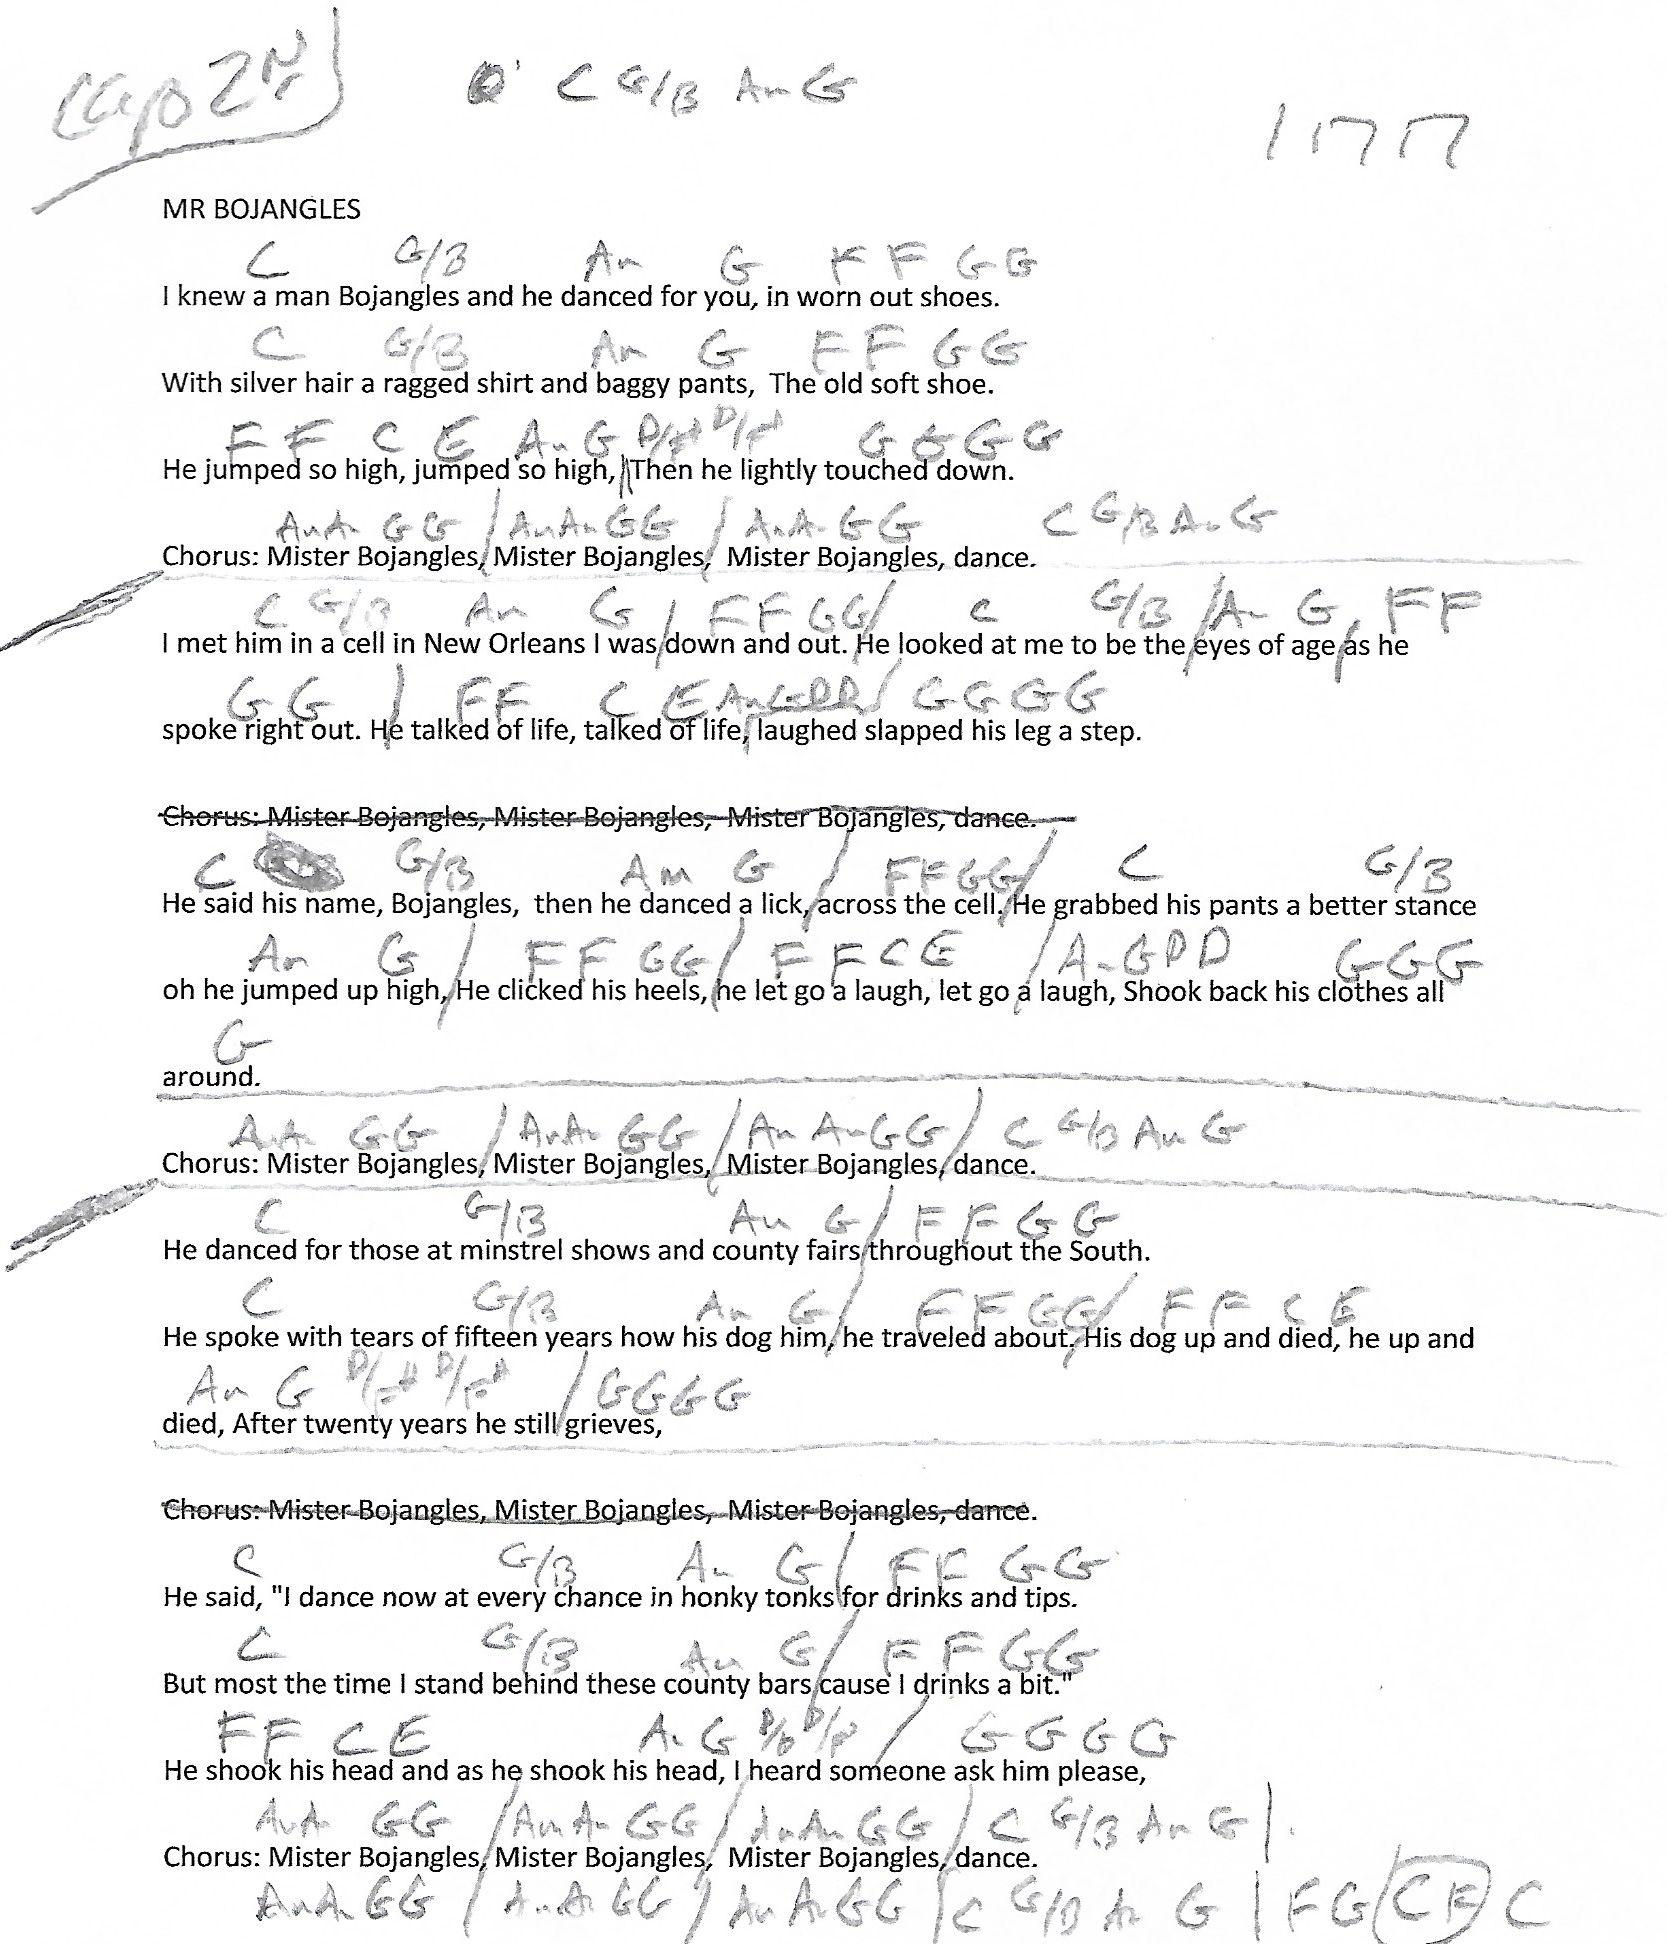 Mr bojangles jerry jeff walker guitar chord chart with lyrics mr bojangles jerry jeff walker guitar chord chart with lyrics http hexwebz Image collections